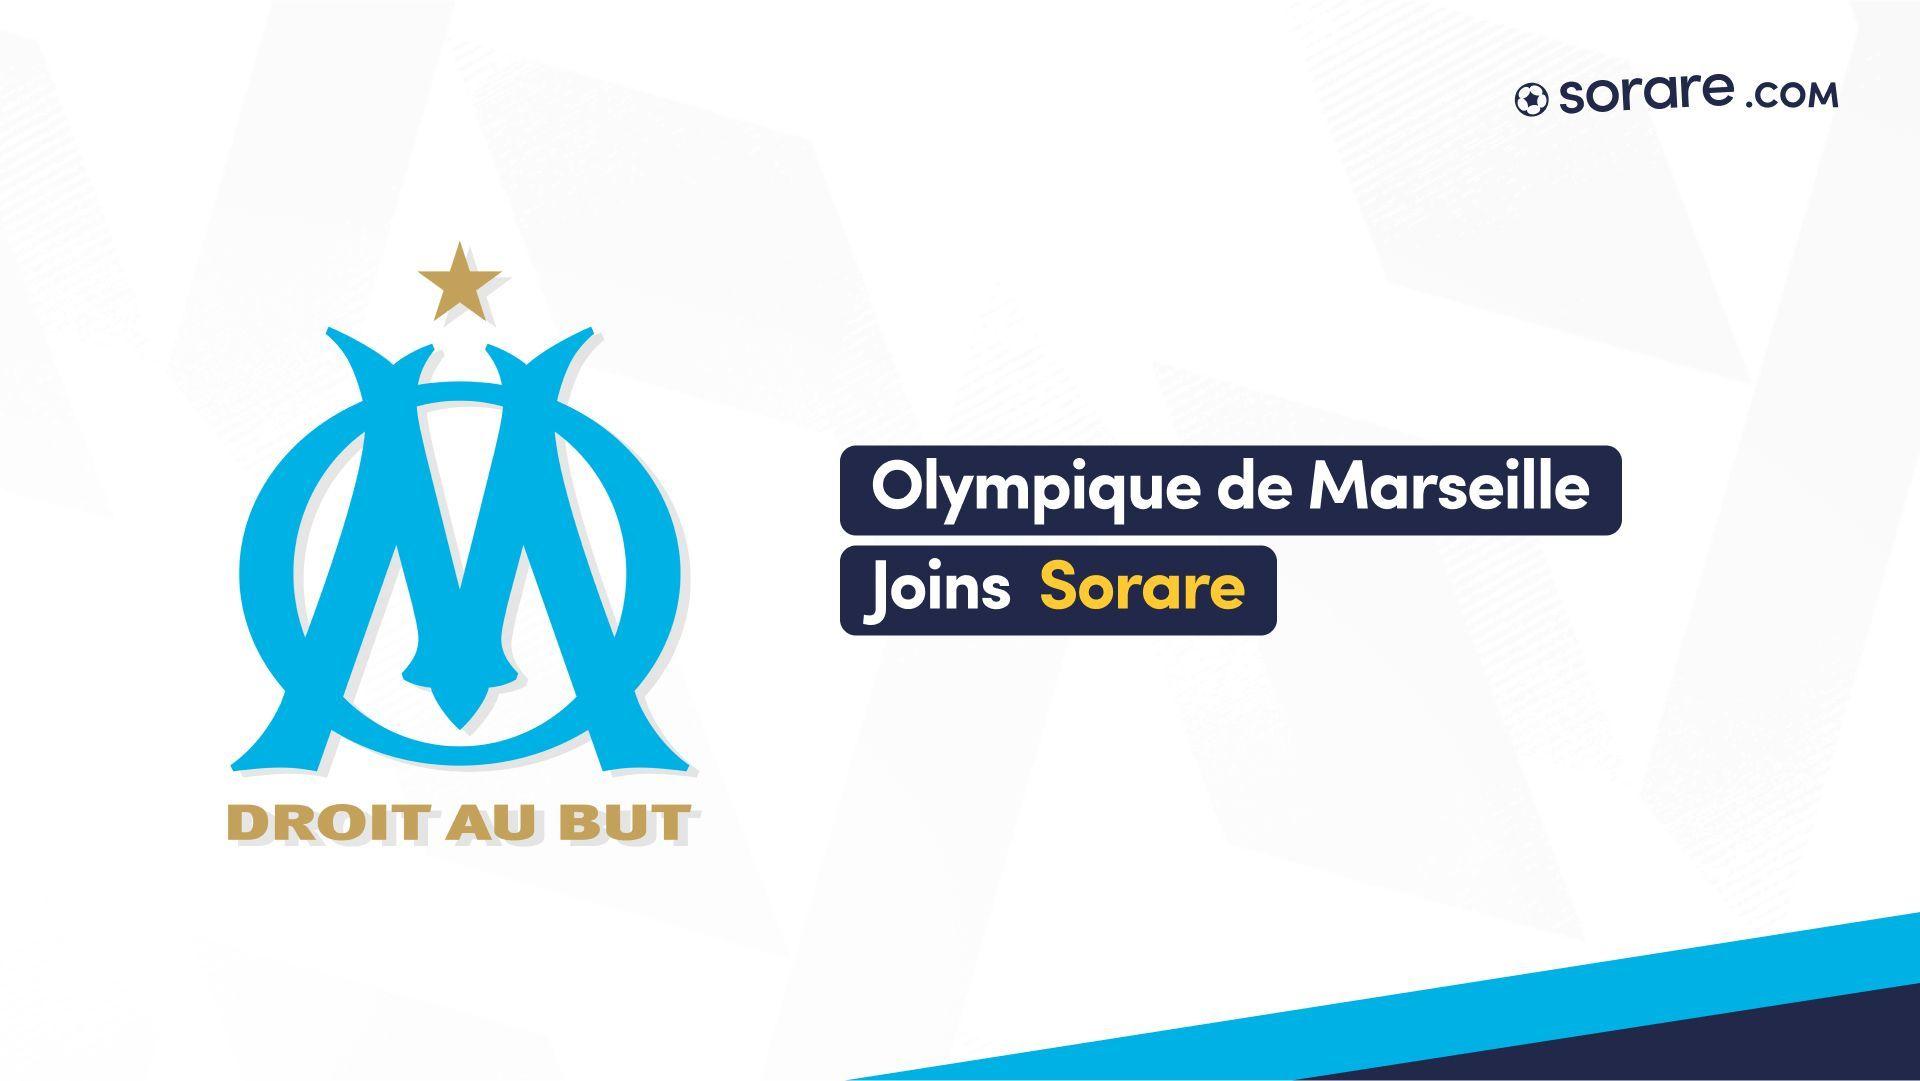 Sorare (tokens NFT) rentre en partenariat avec l'Olympique de Marseille (OM)